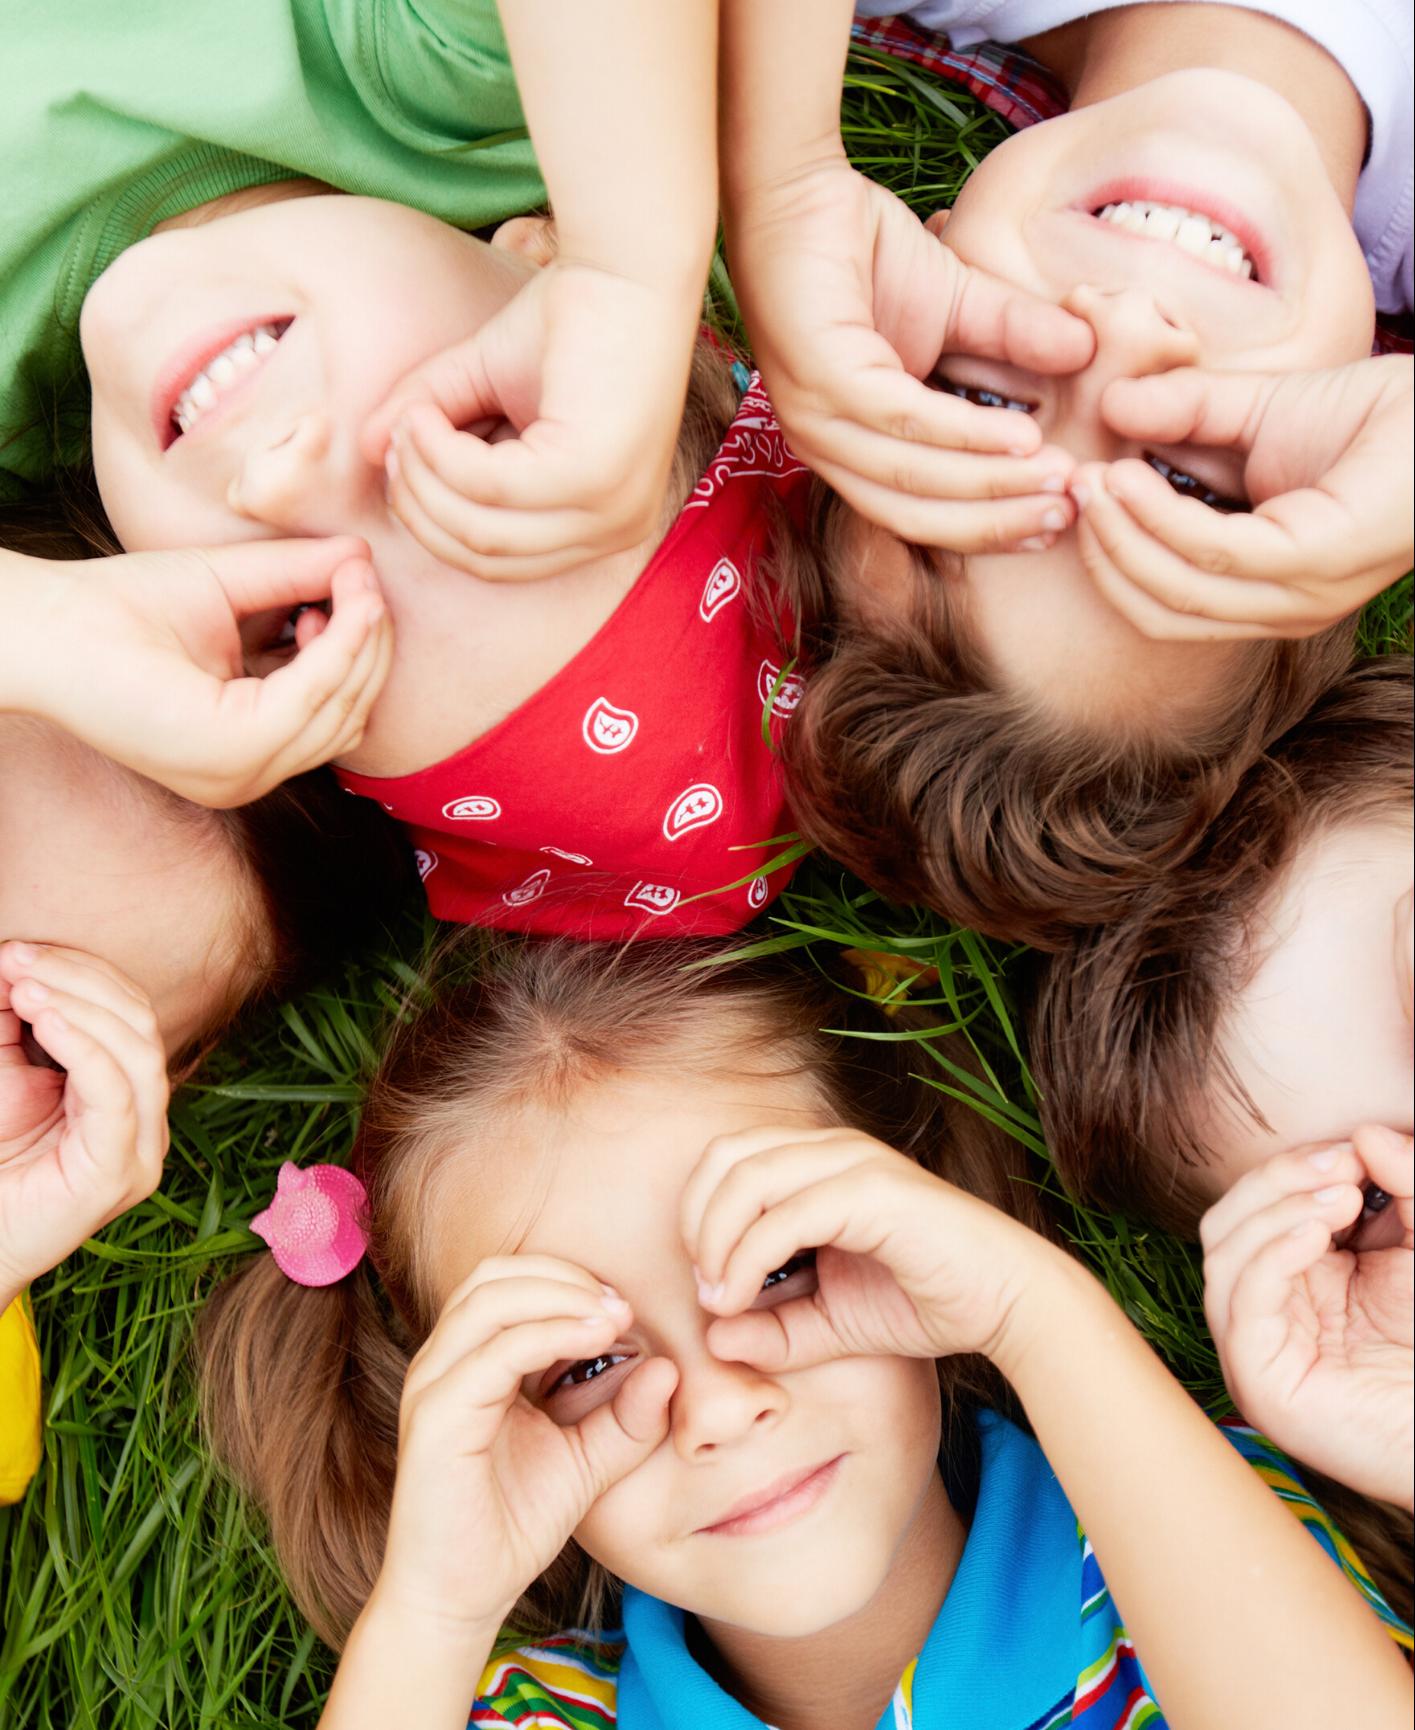 barnyoga, barnyoga kurser, kurser hösttermin 2020, familjeyoga, barnkurser i stockholm, children's yoga